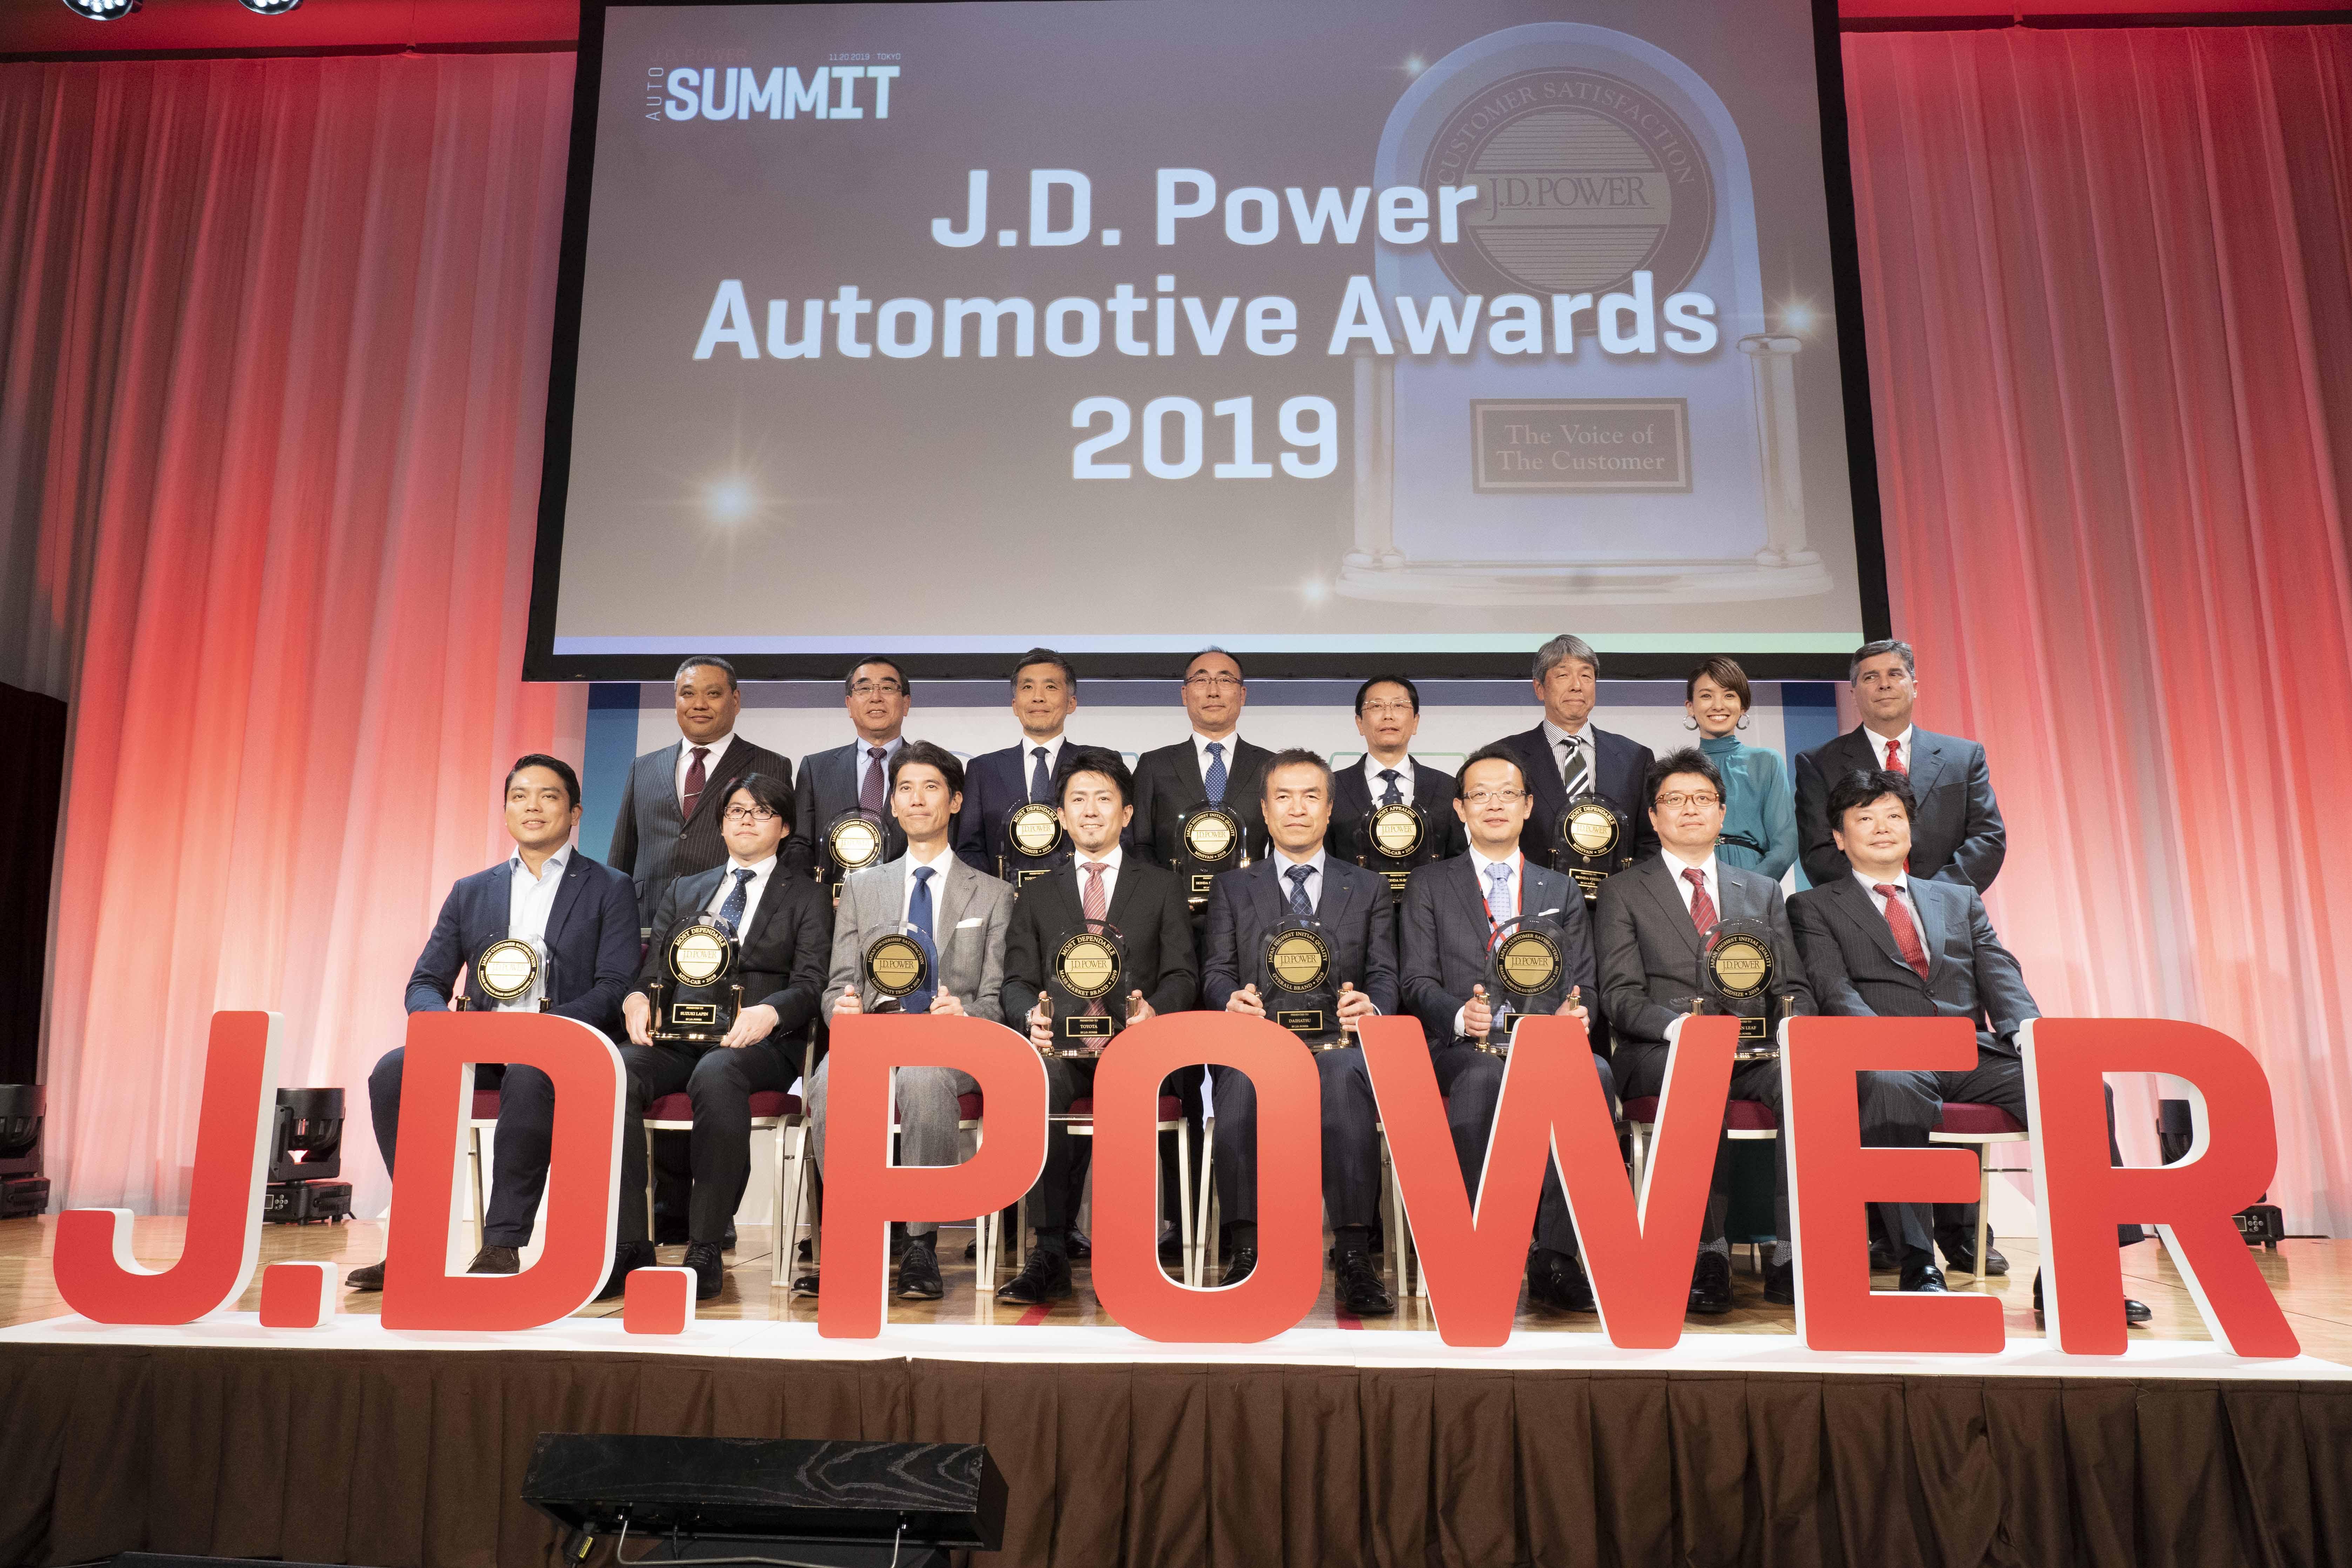 J.D. Power Auto Summit 2019を開催 画像